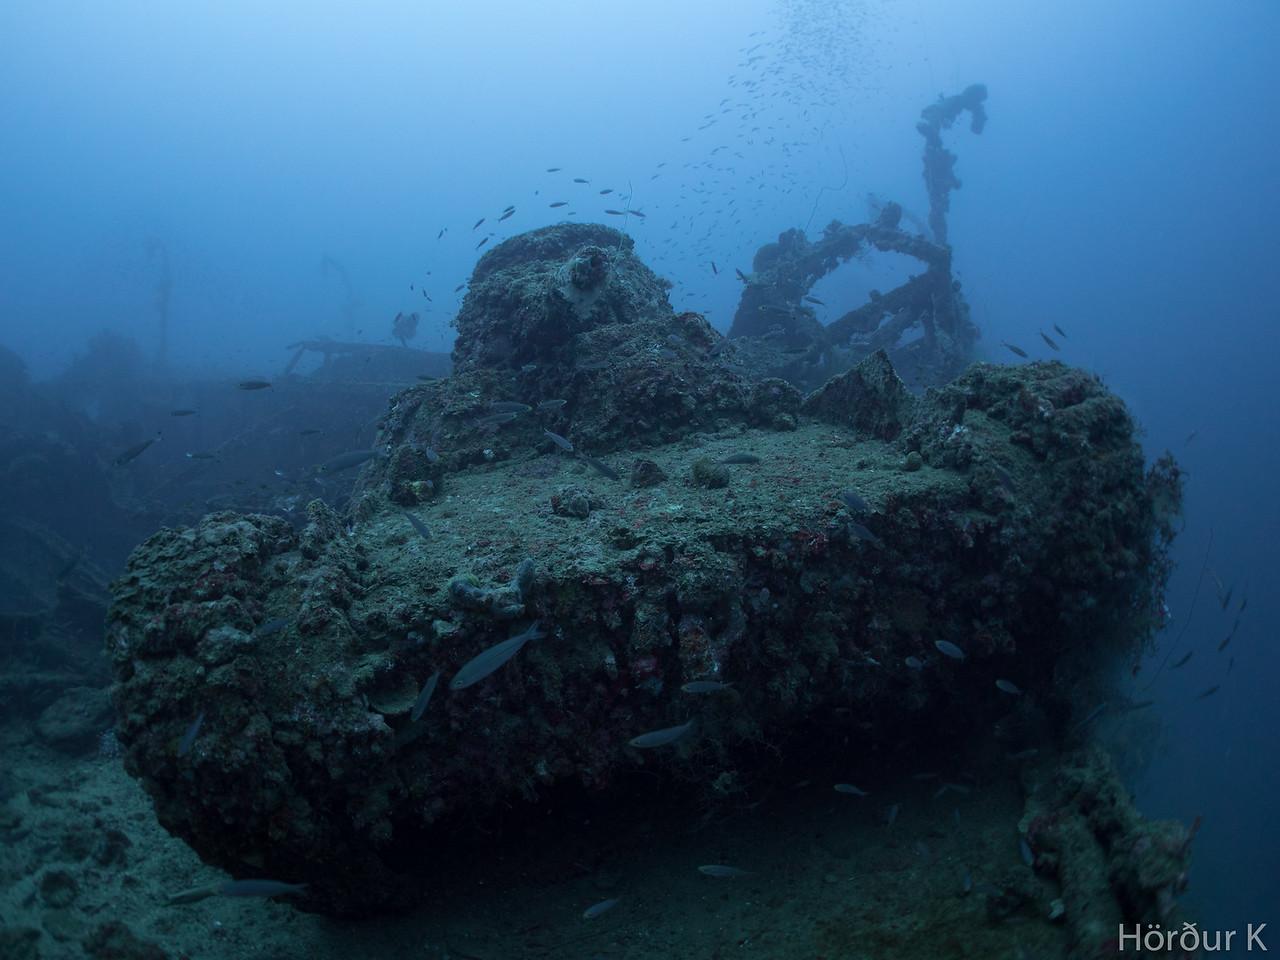 Tank on the San Francisco Maru